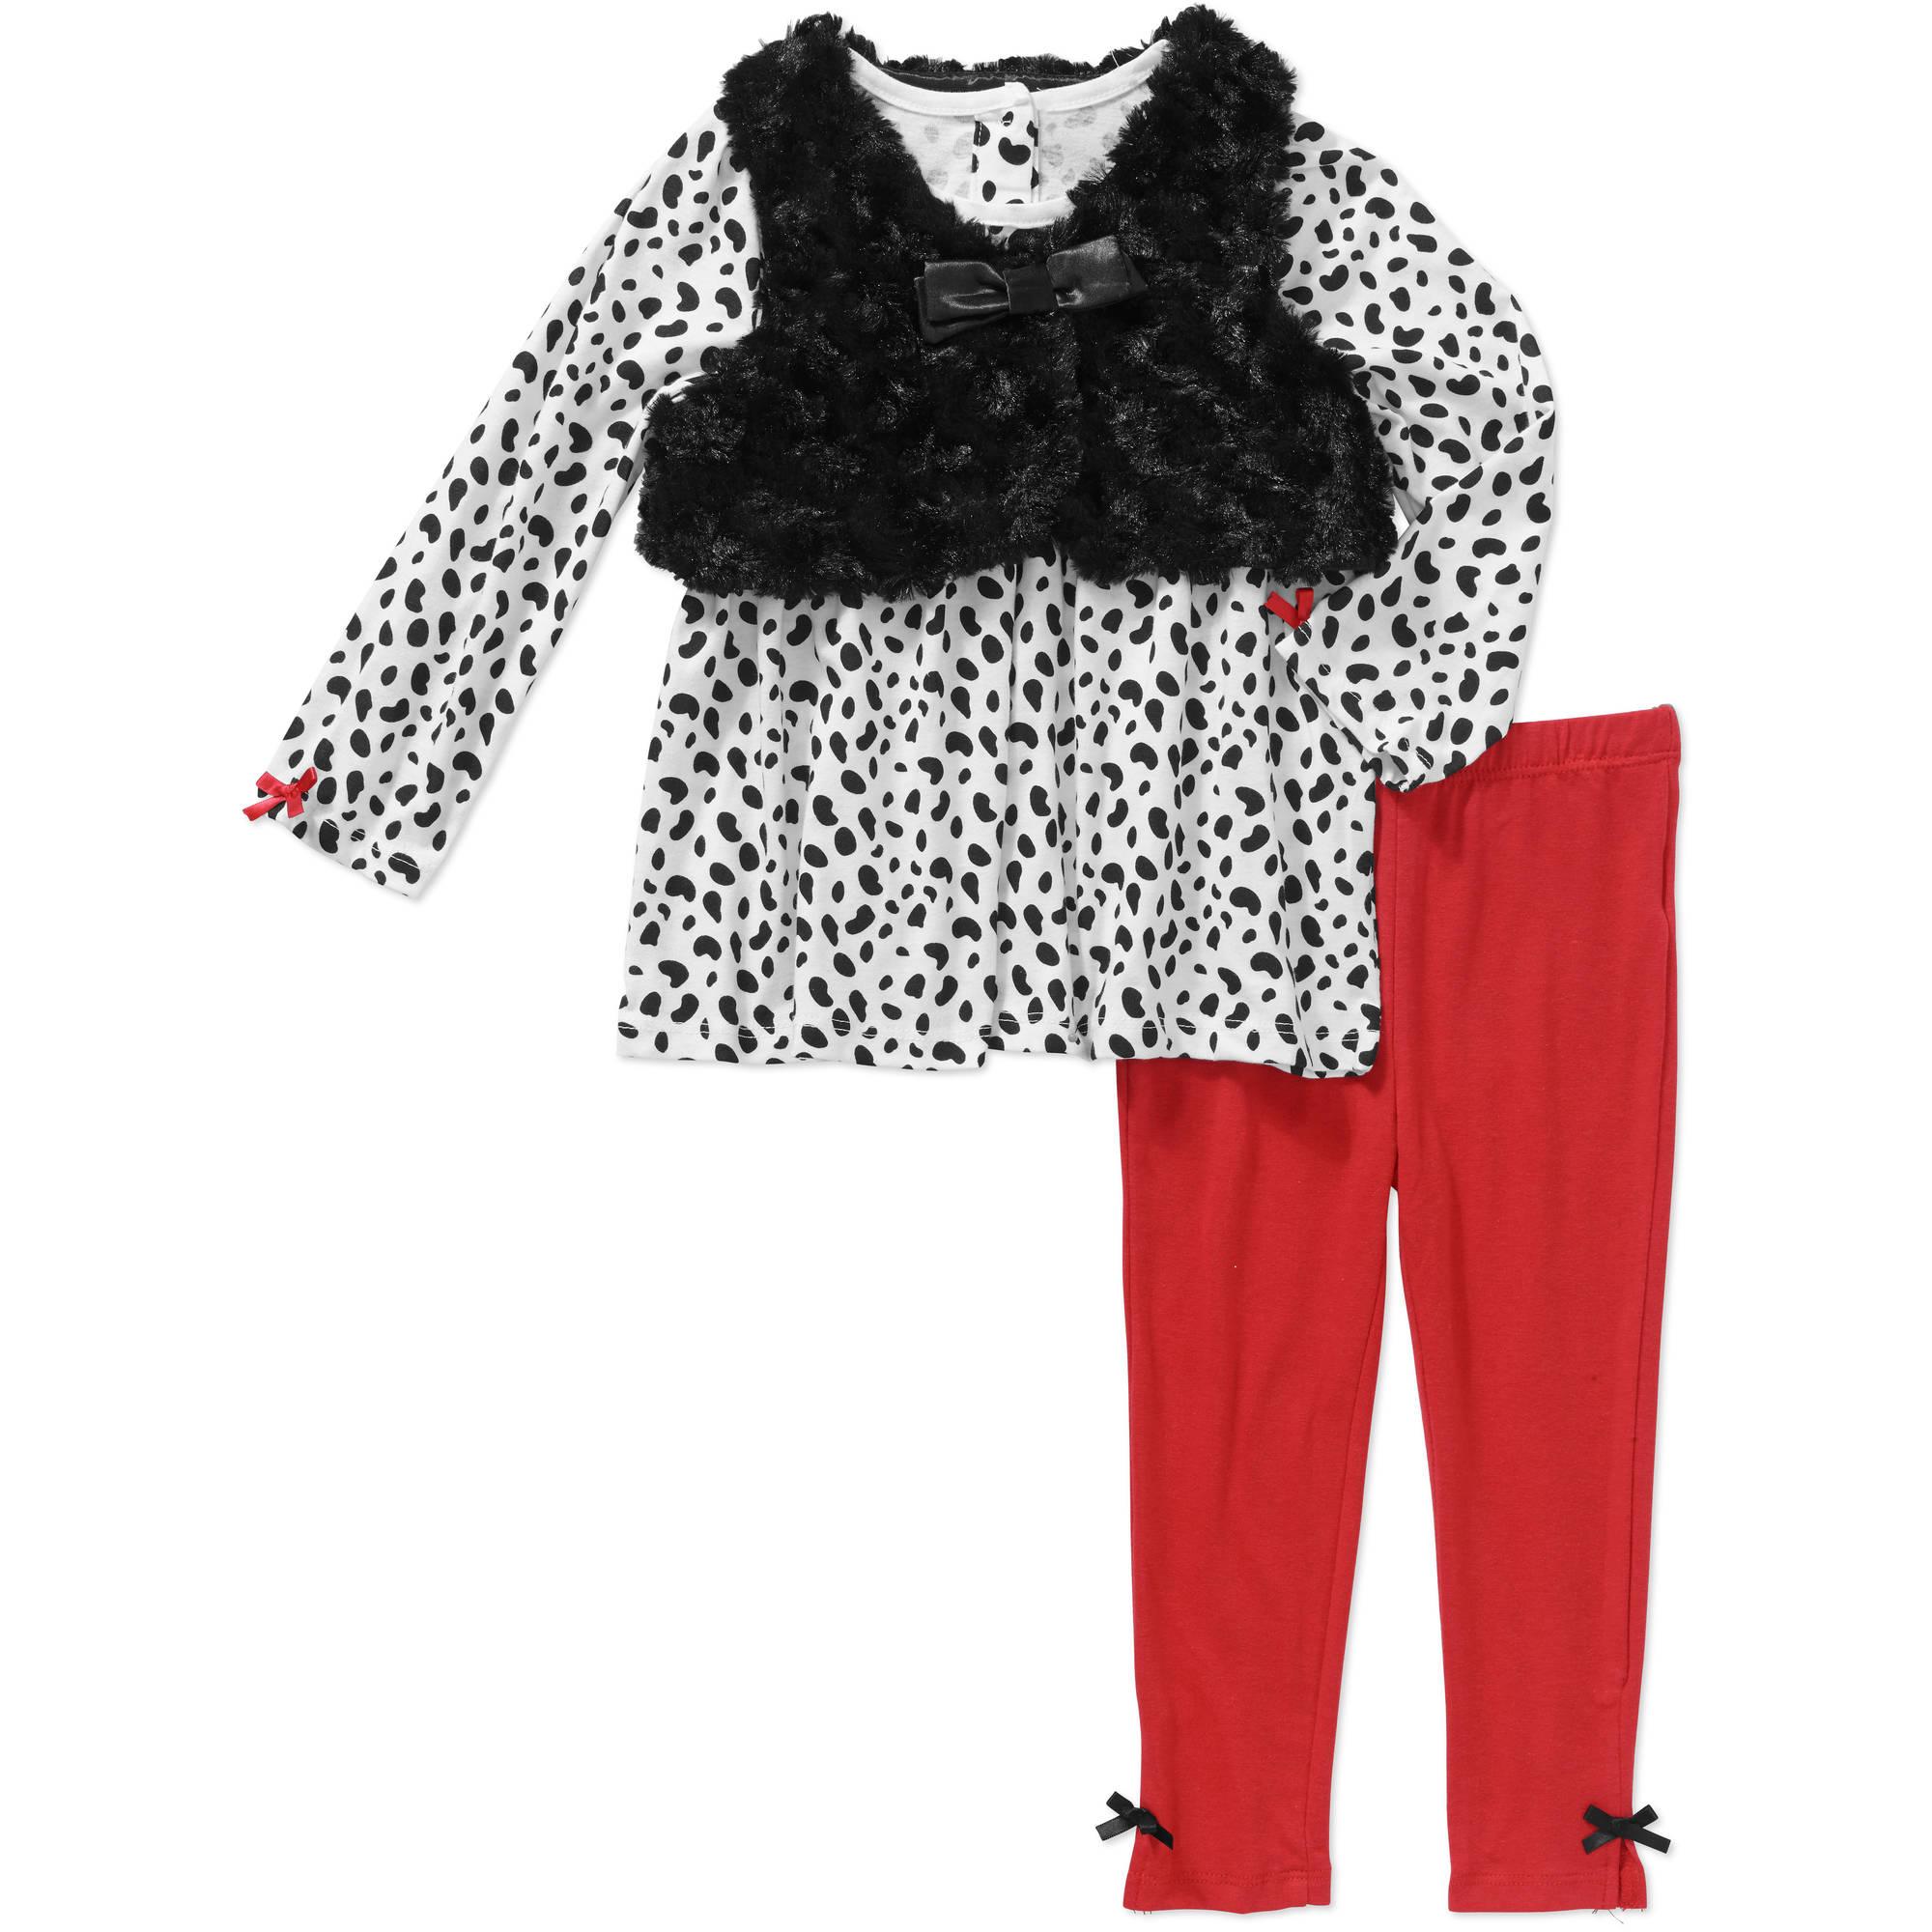 Quiltex Newborn Baby Girl Cheetah Print Top, Legging, and Faux Fur Vest 3 pc Set